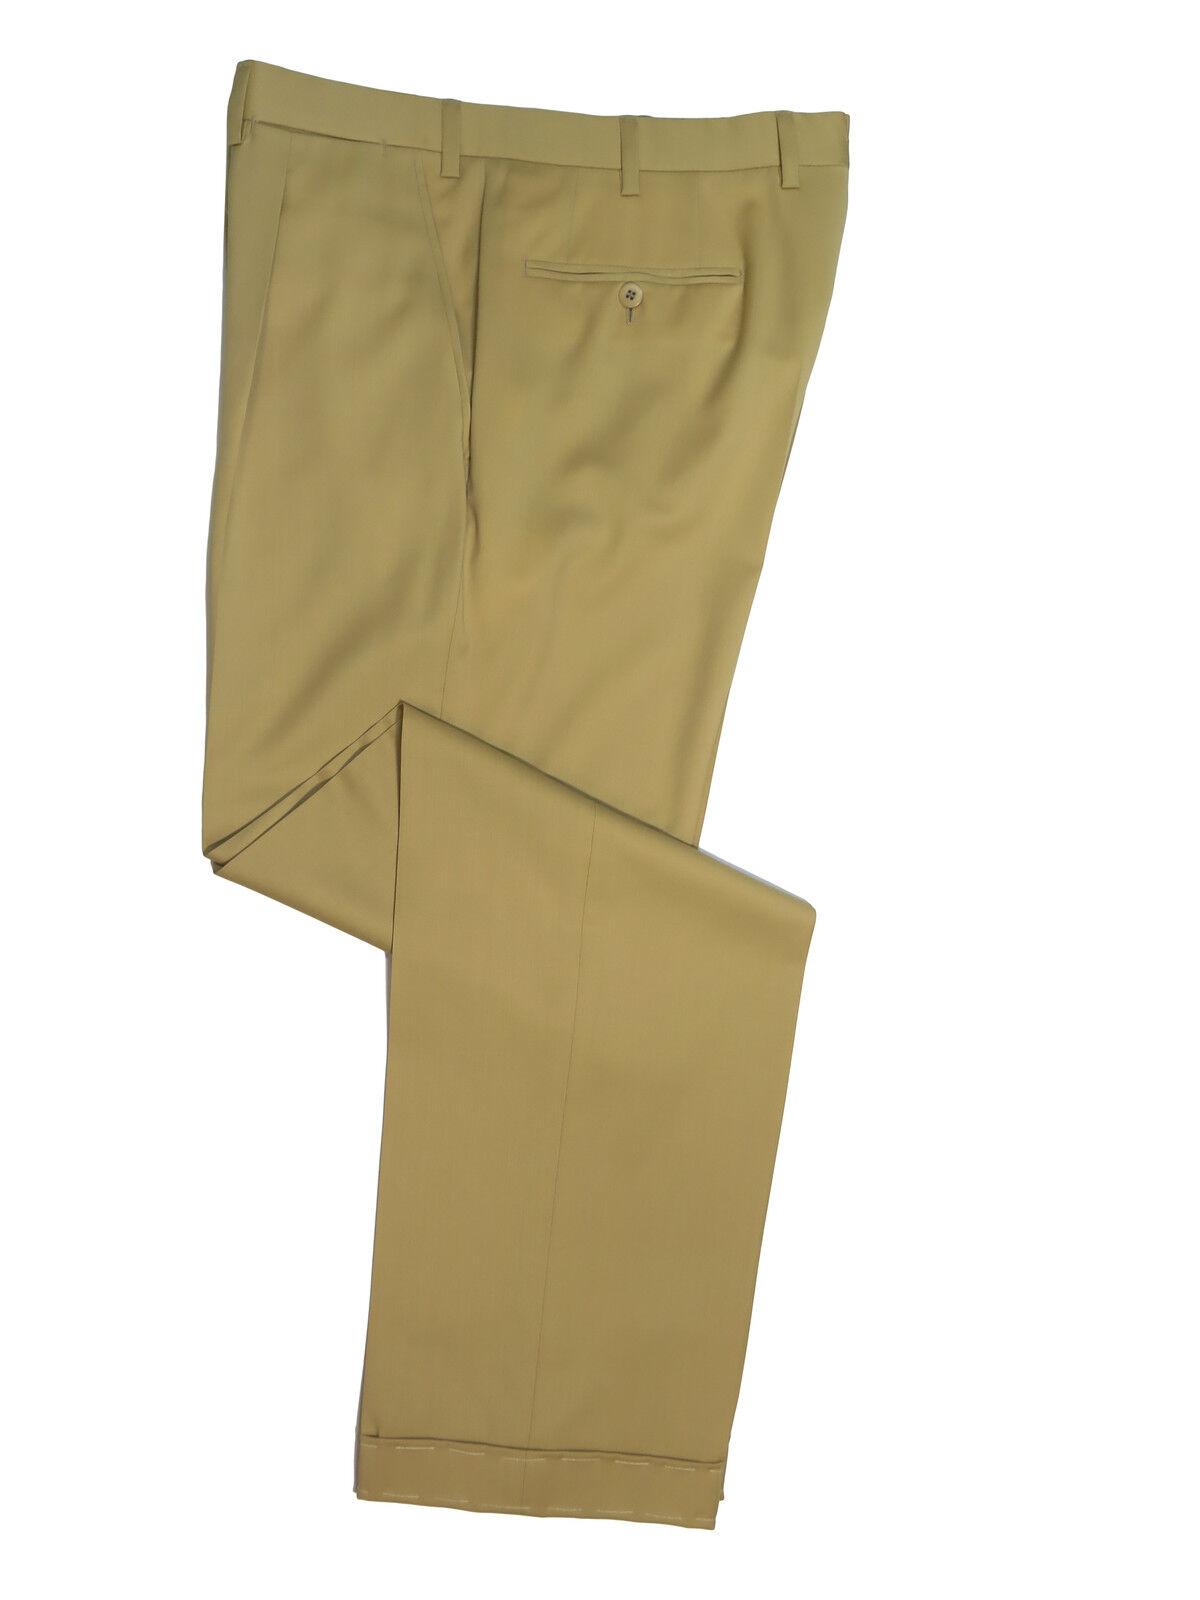 Brioni  Men's Khaki Delta Lightweight Wool Casual Pants 34